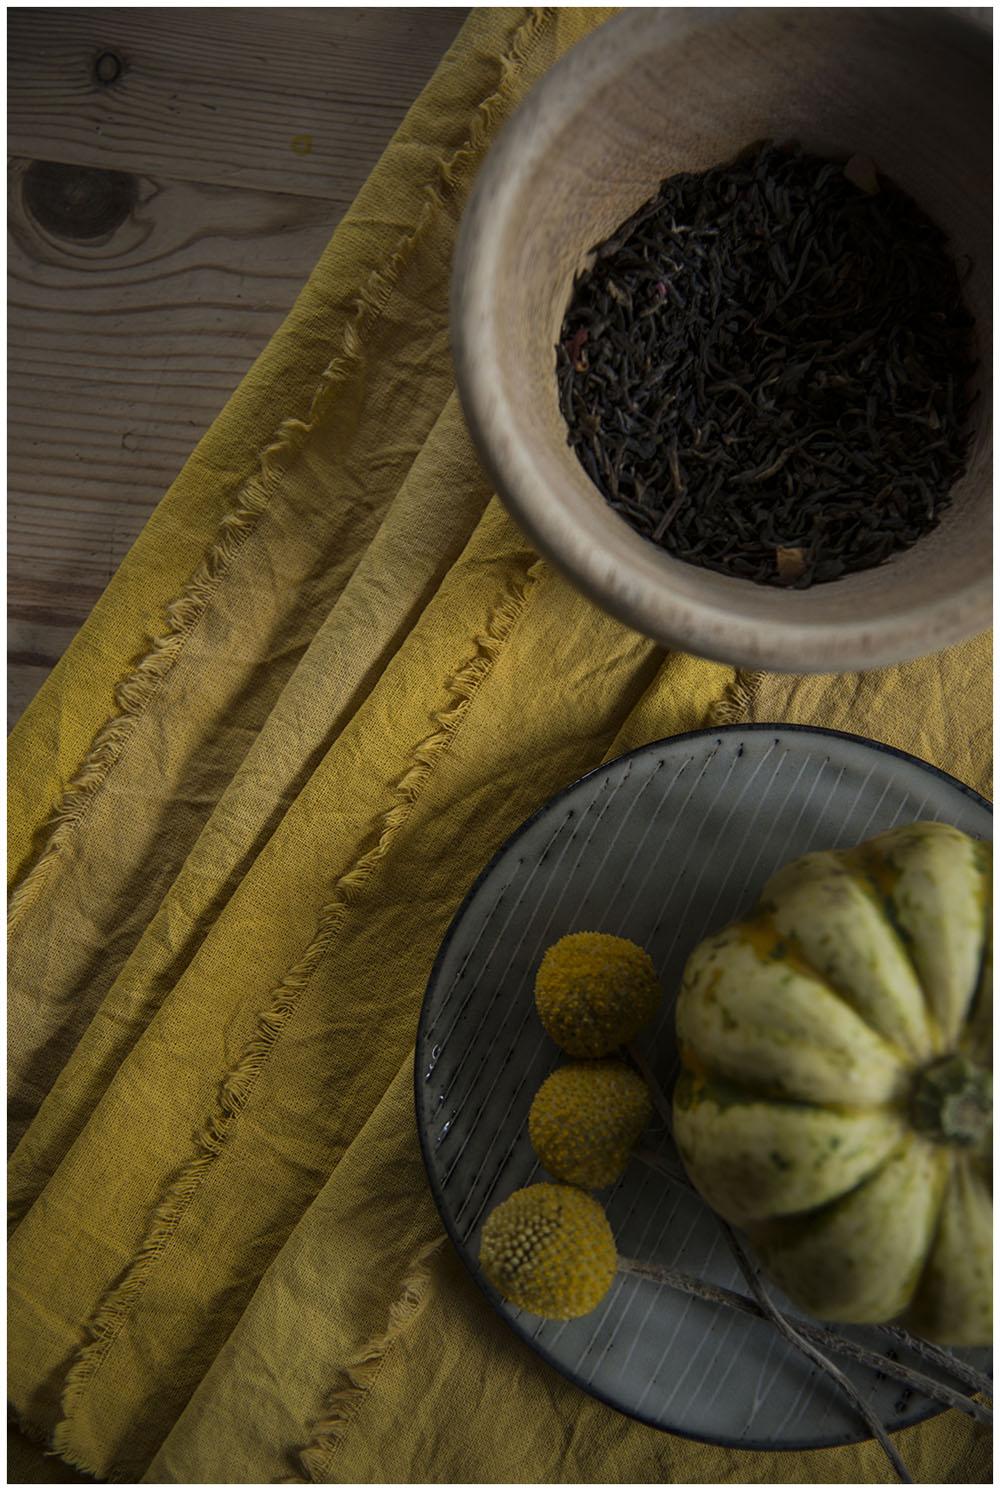 Turmeric and tea dyed napkins